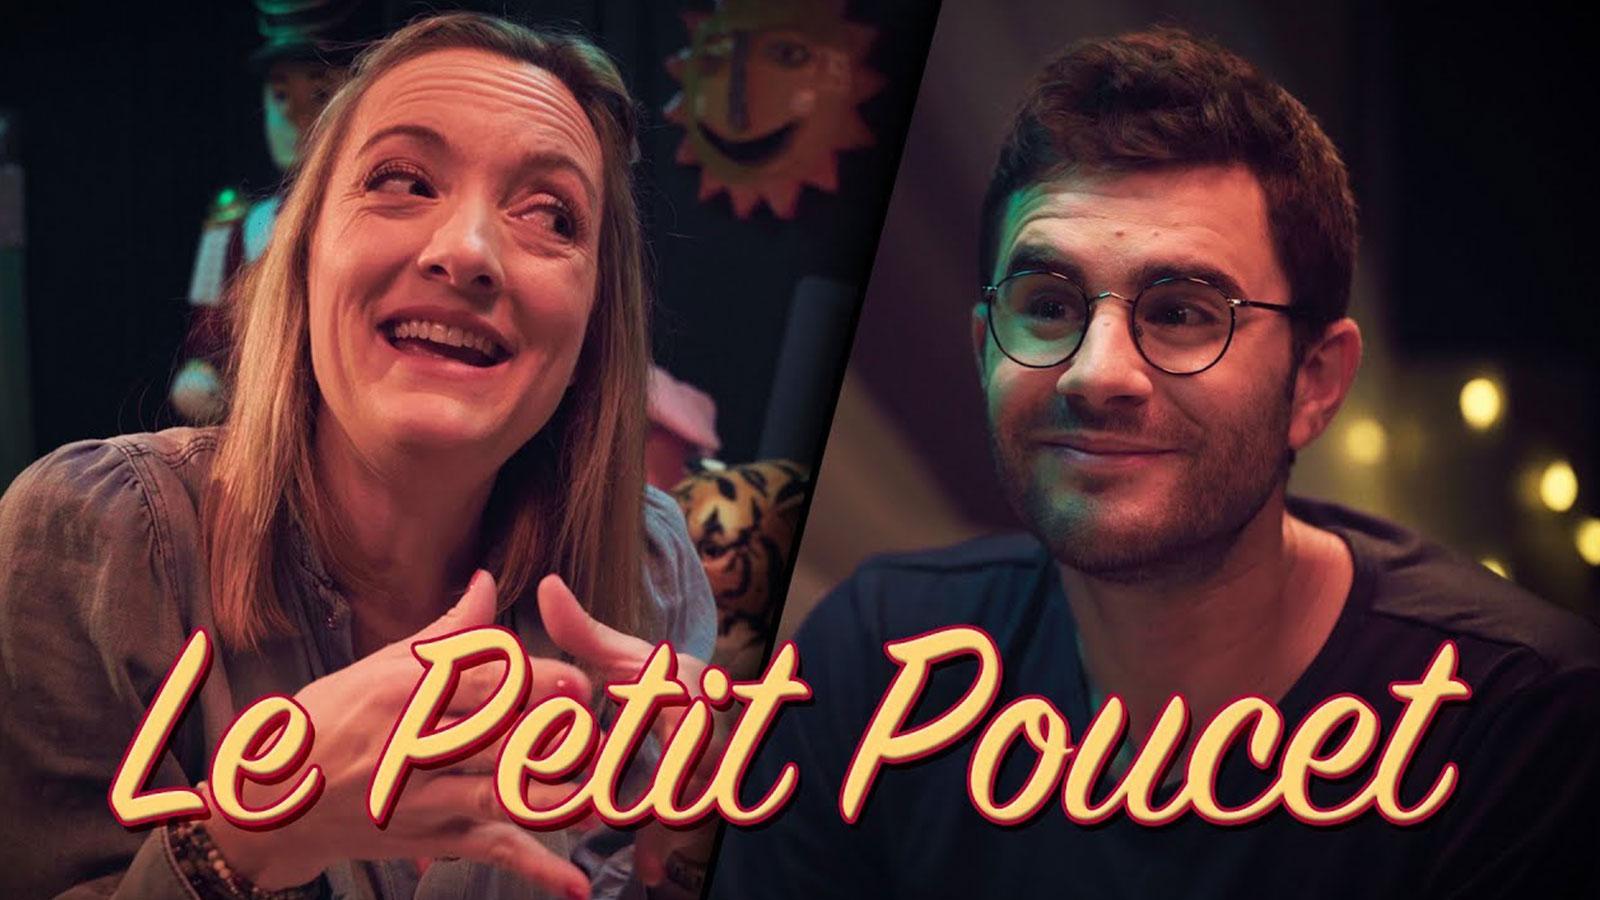 Dorothée Pousséo / YouTube